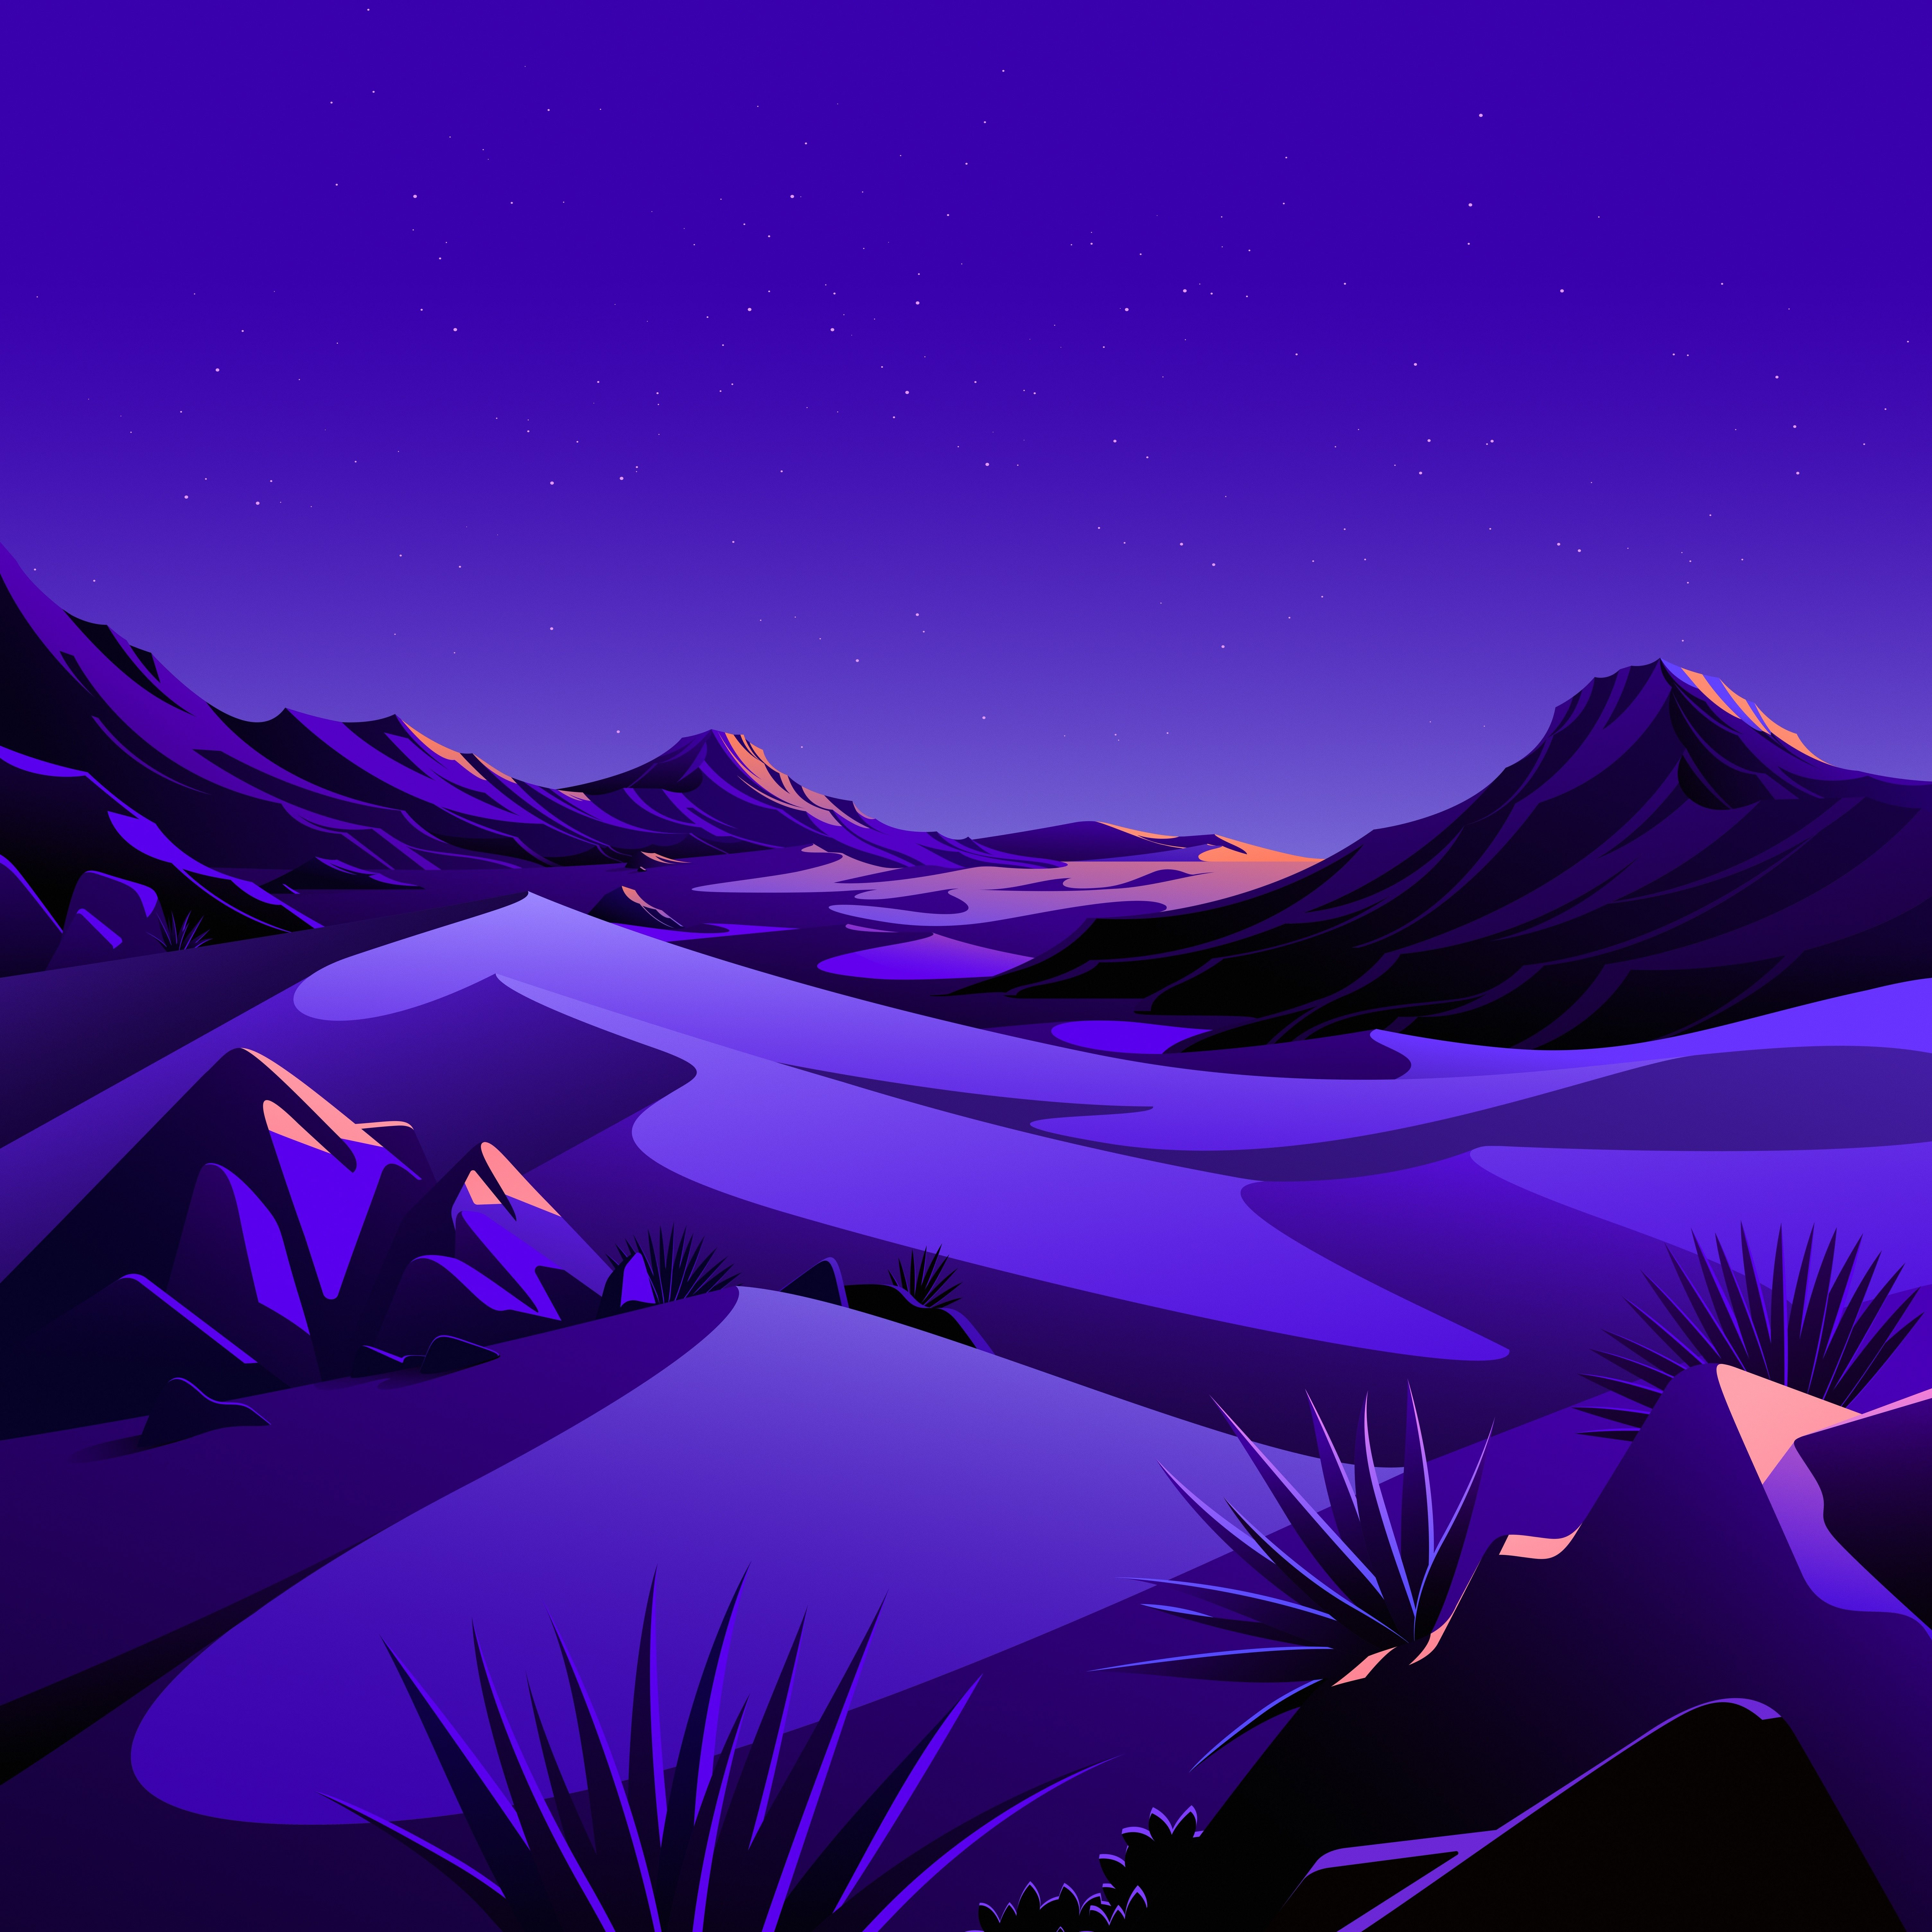 macOS Big Sur The Desert 3 dragged